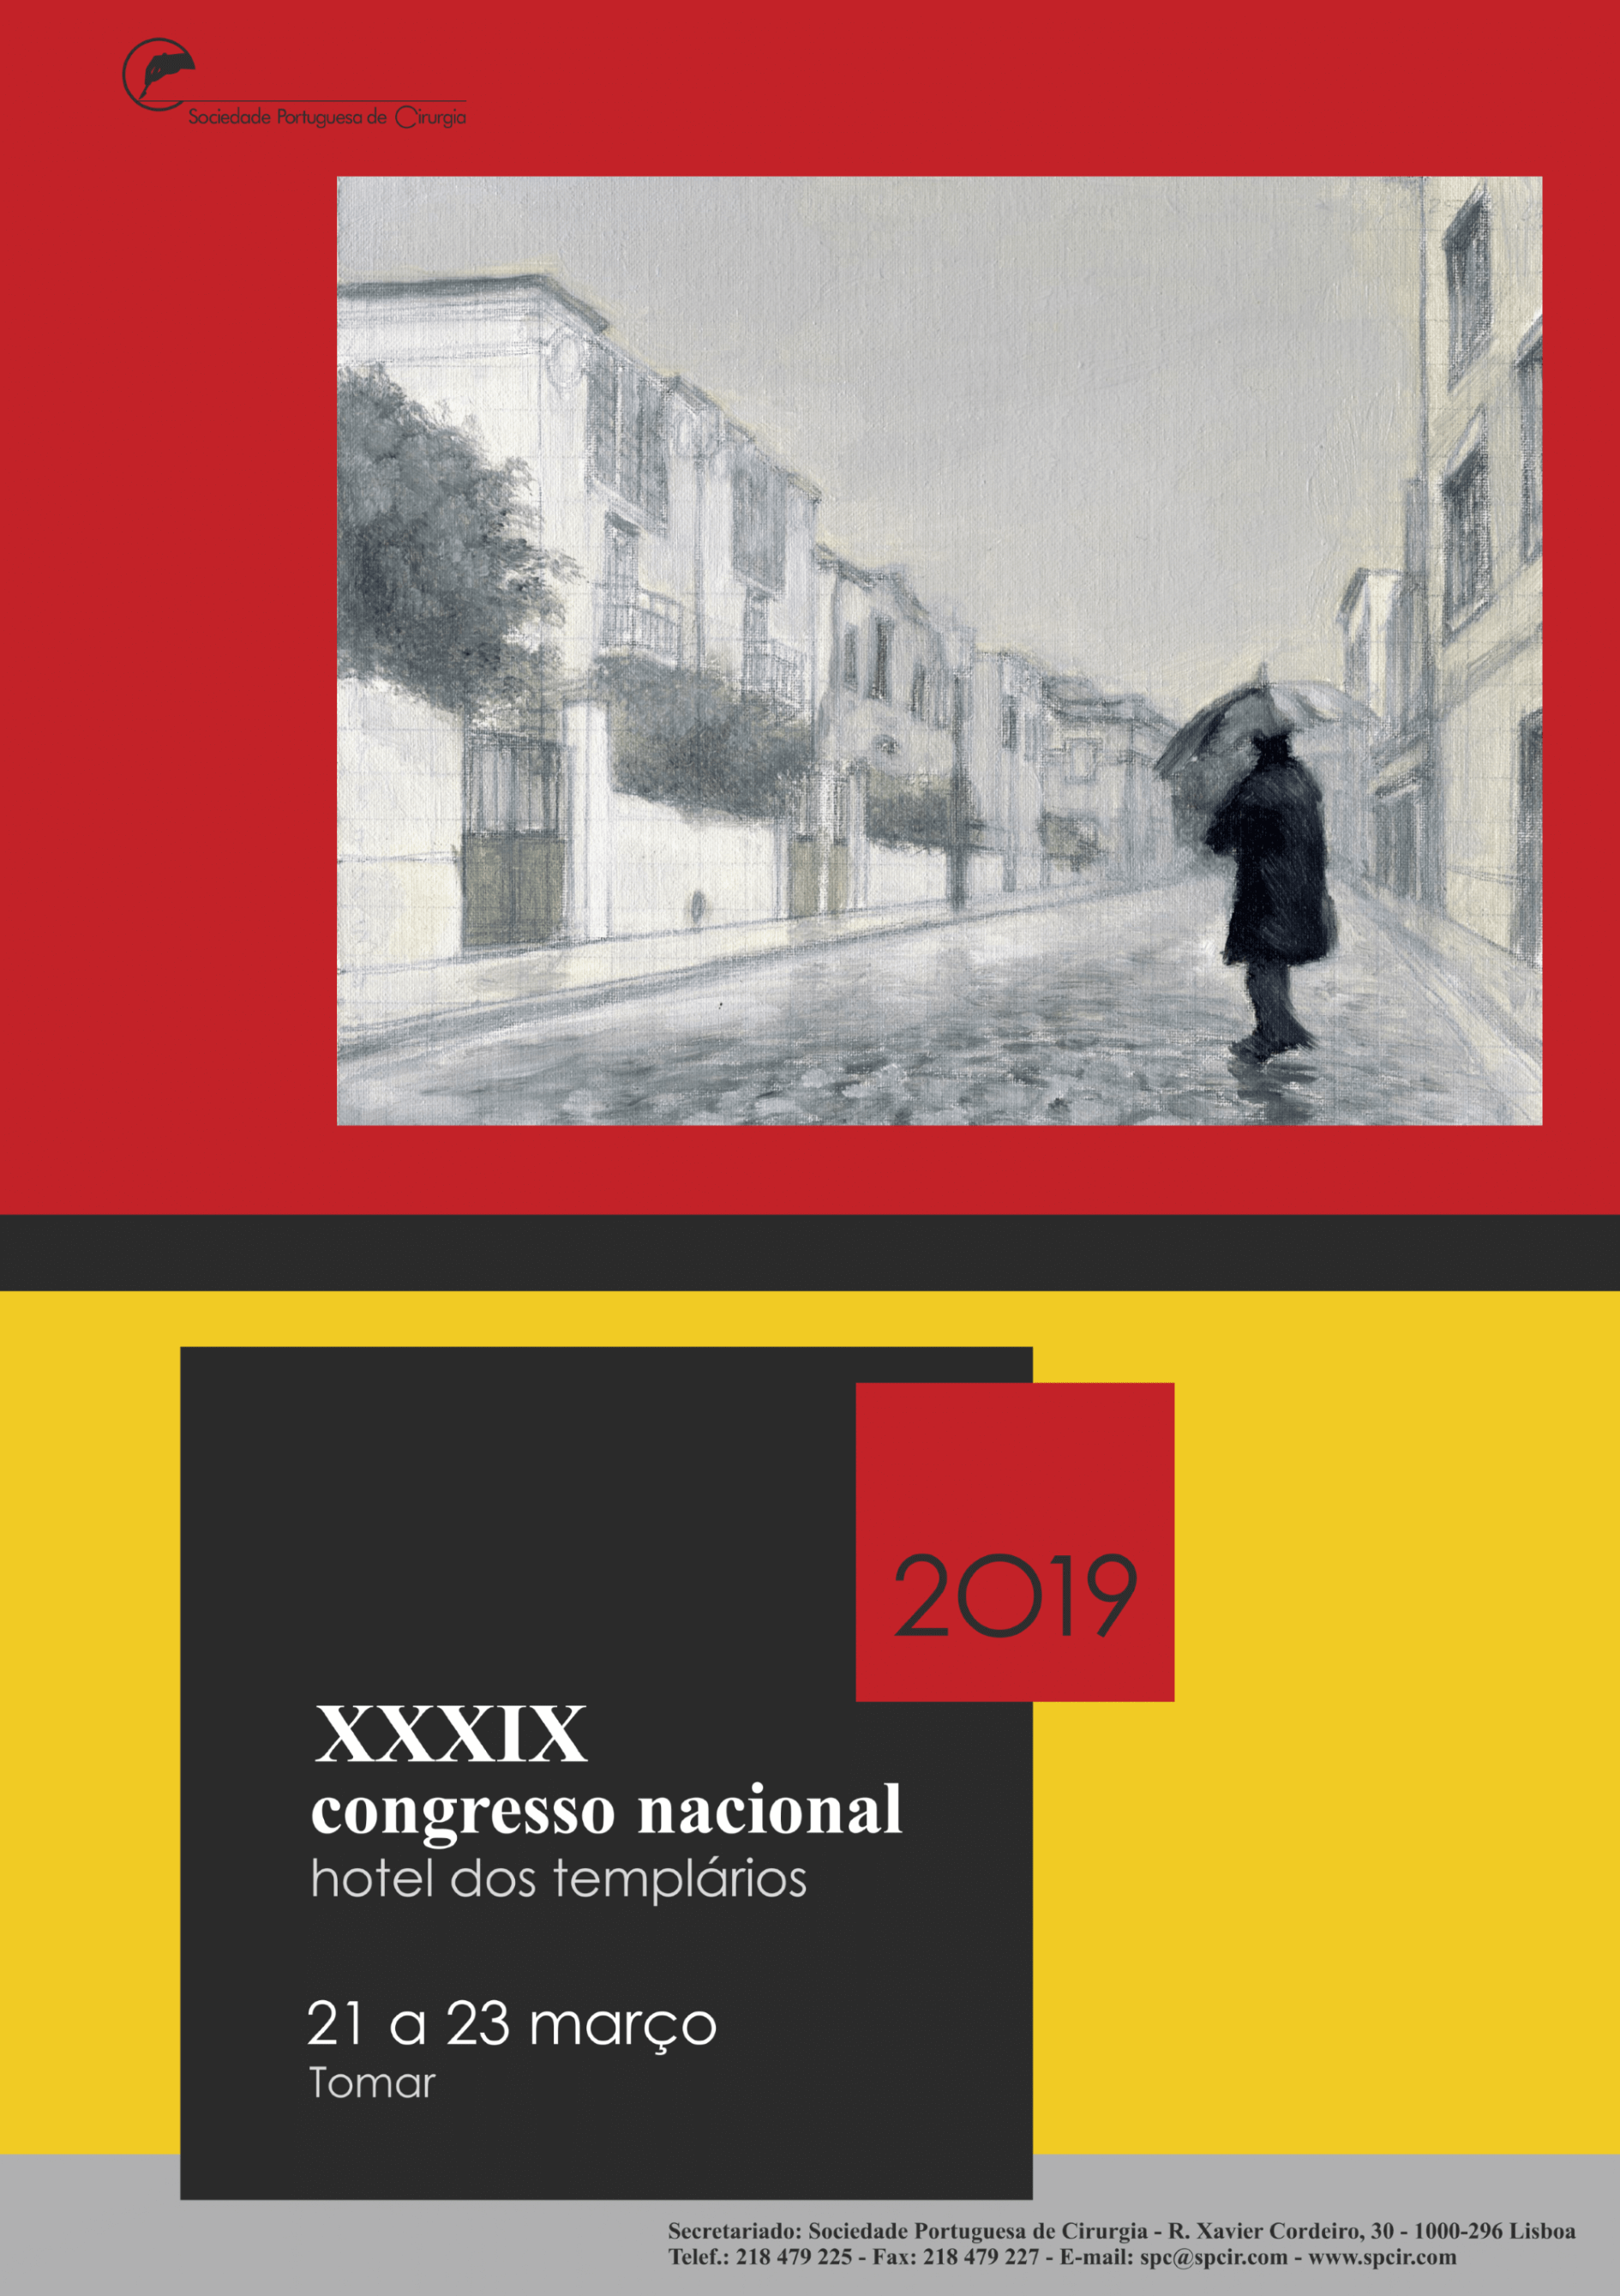 XXXIX Congresso (2019)